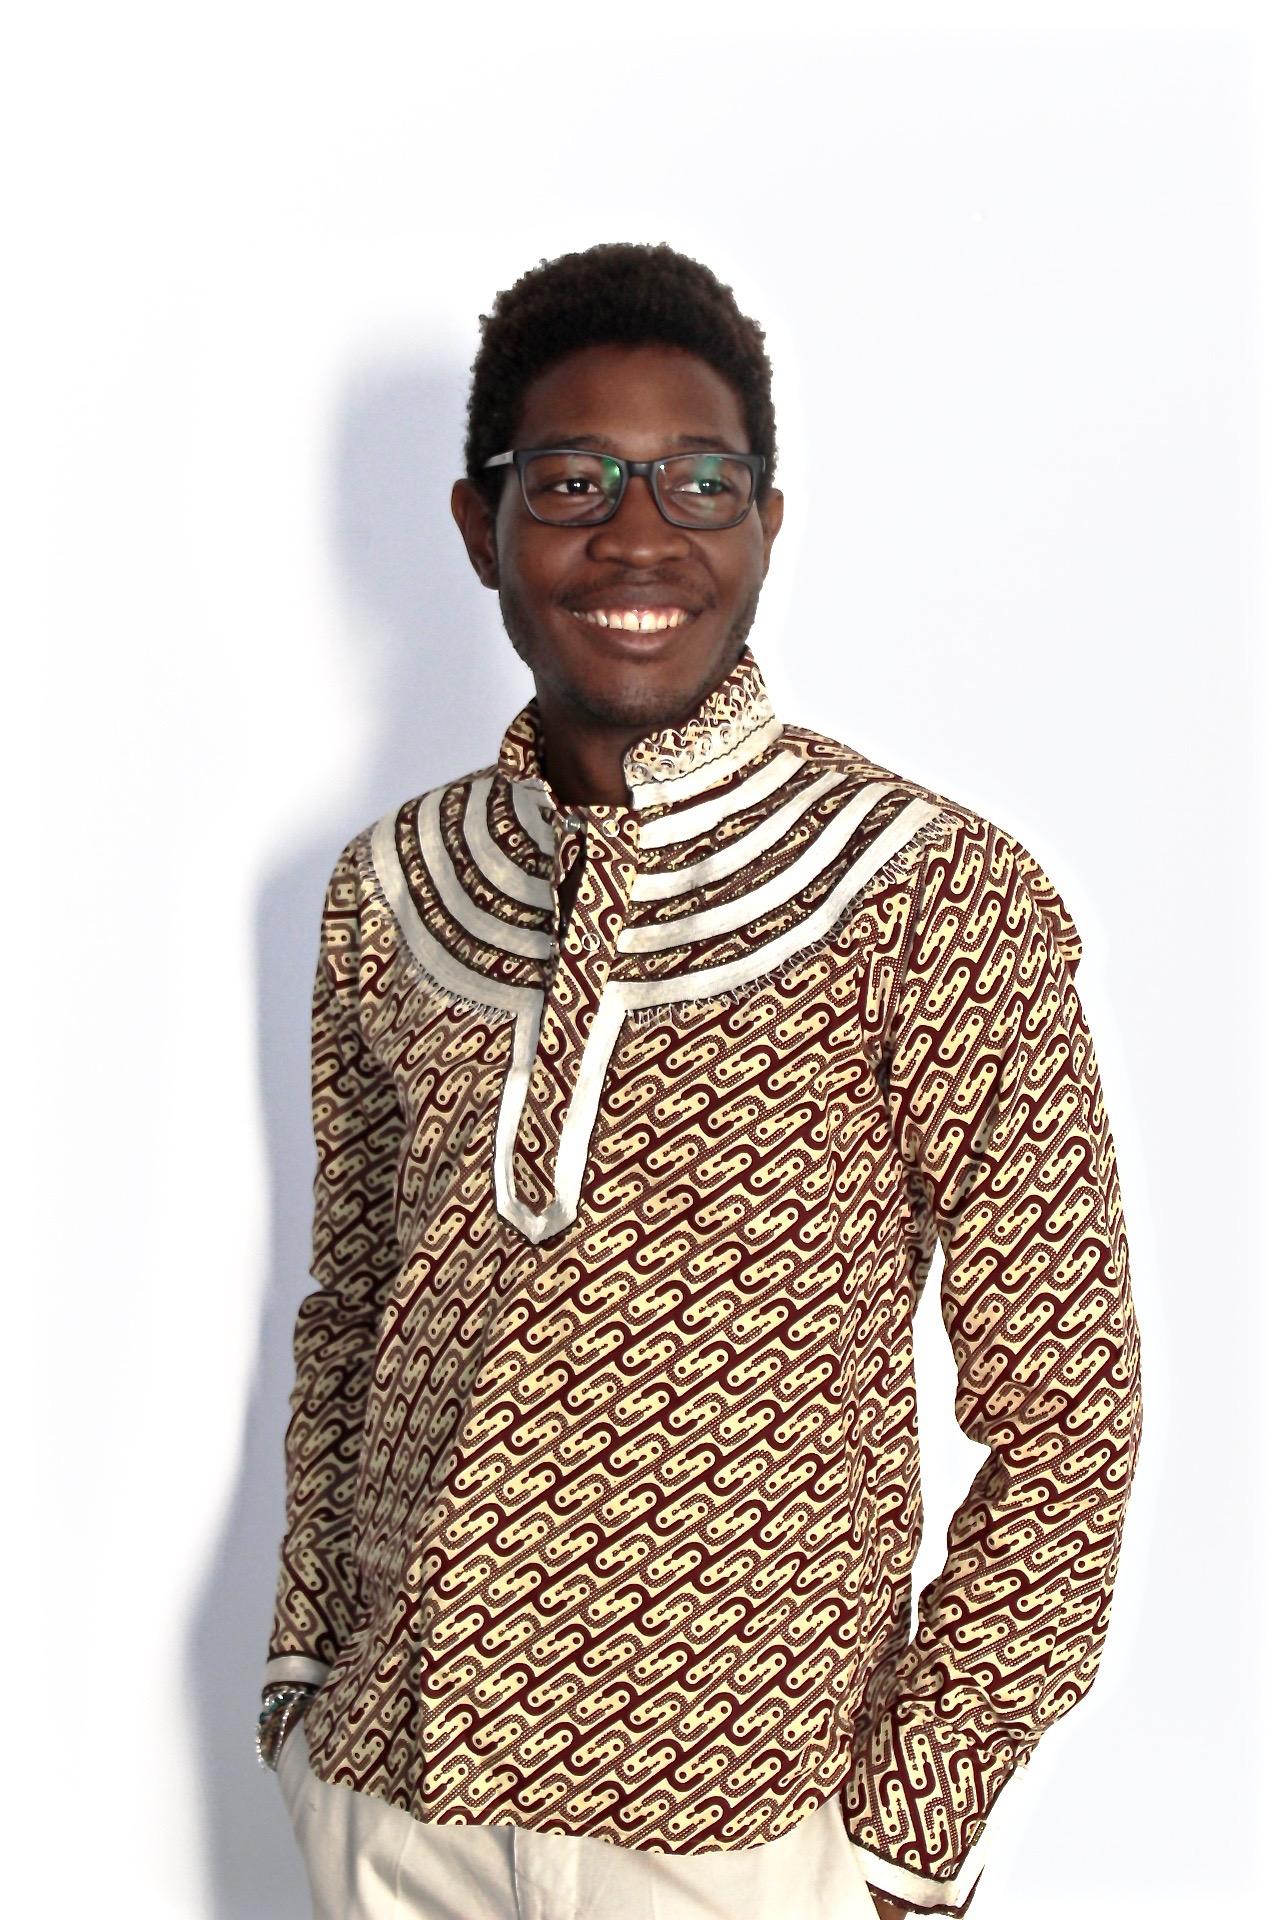 vetement homme wax le modele robe pagne mode africaine moderne. Black Bedroom Furniture Sets. Home Design Ideas